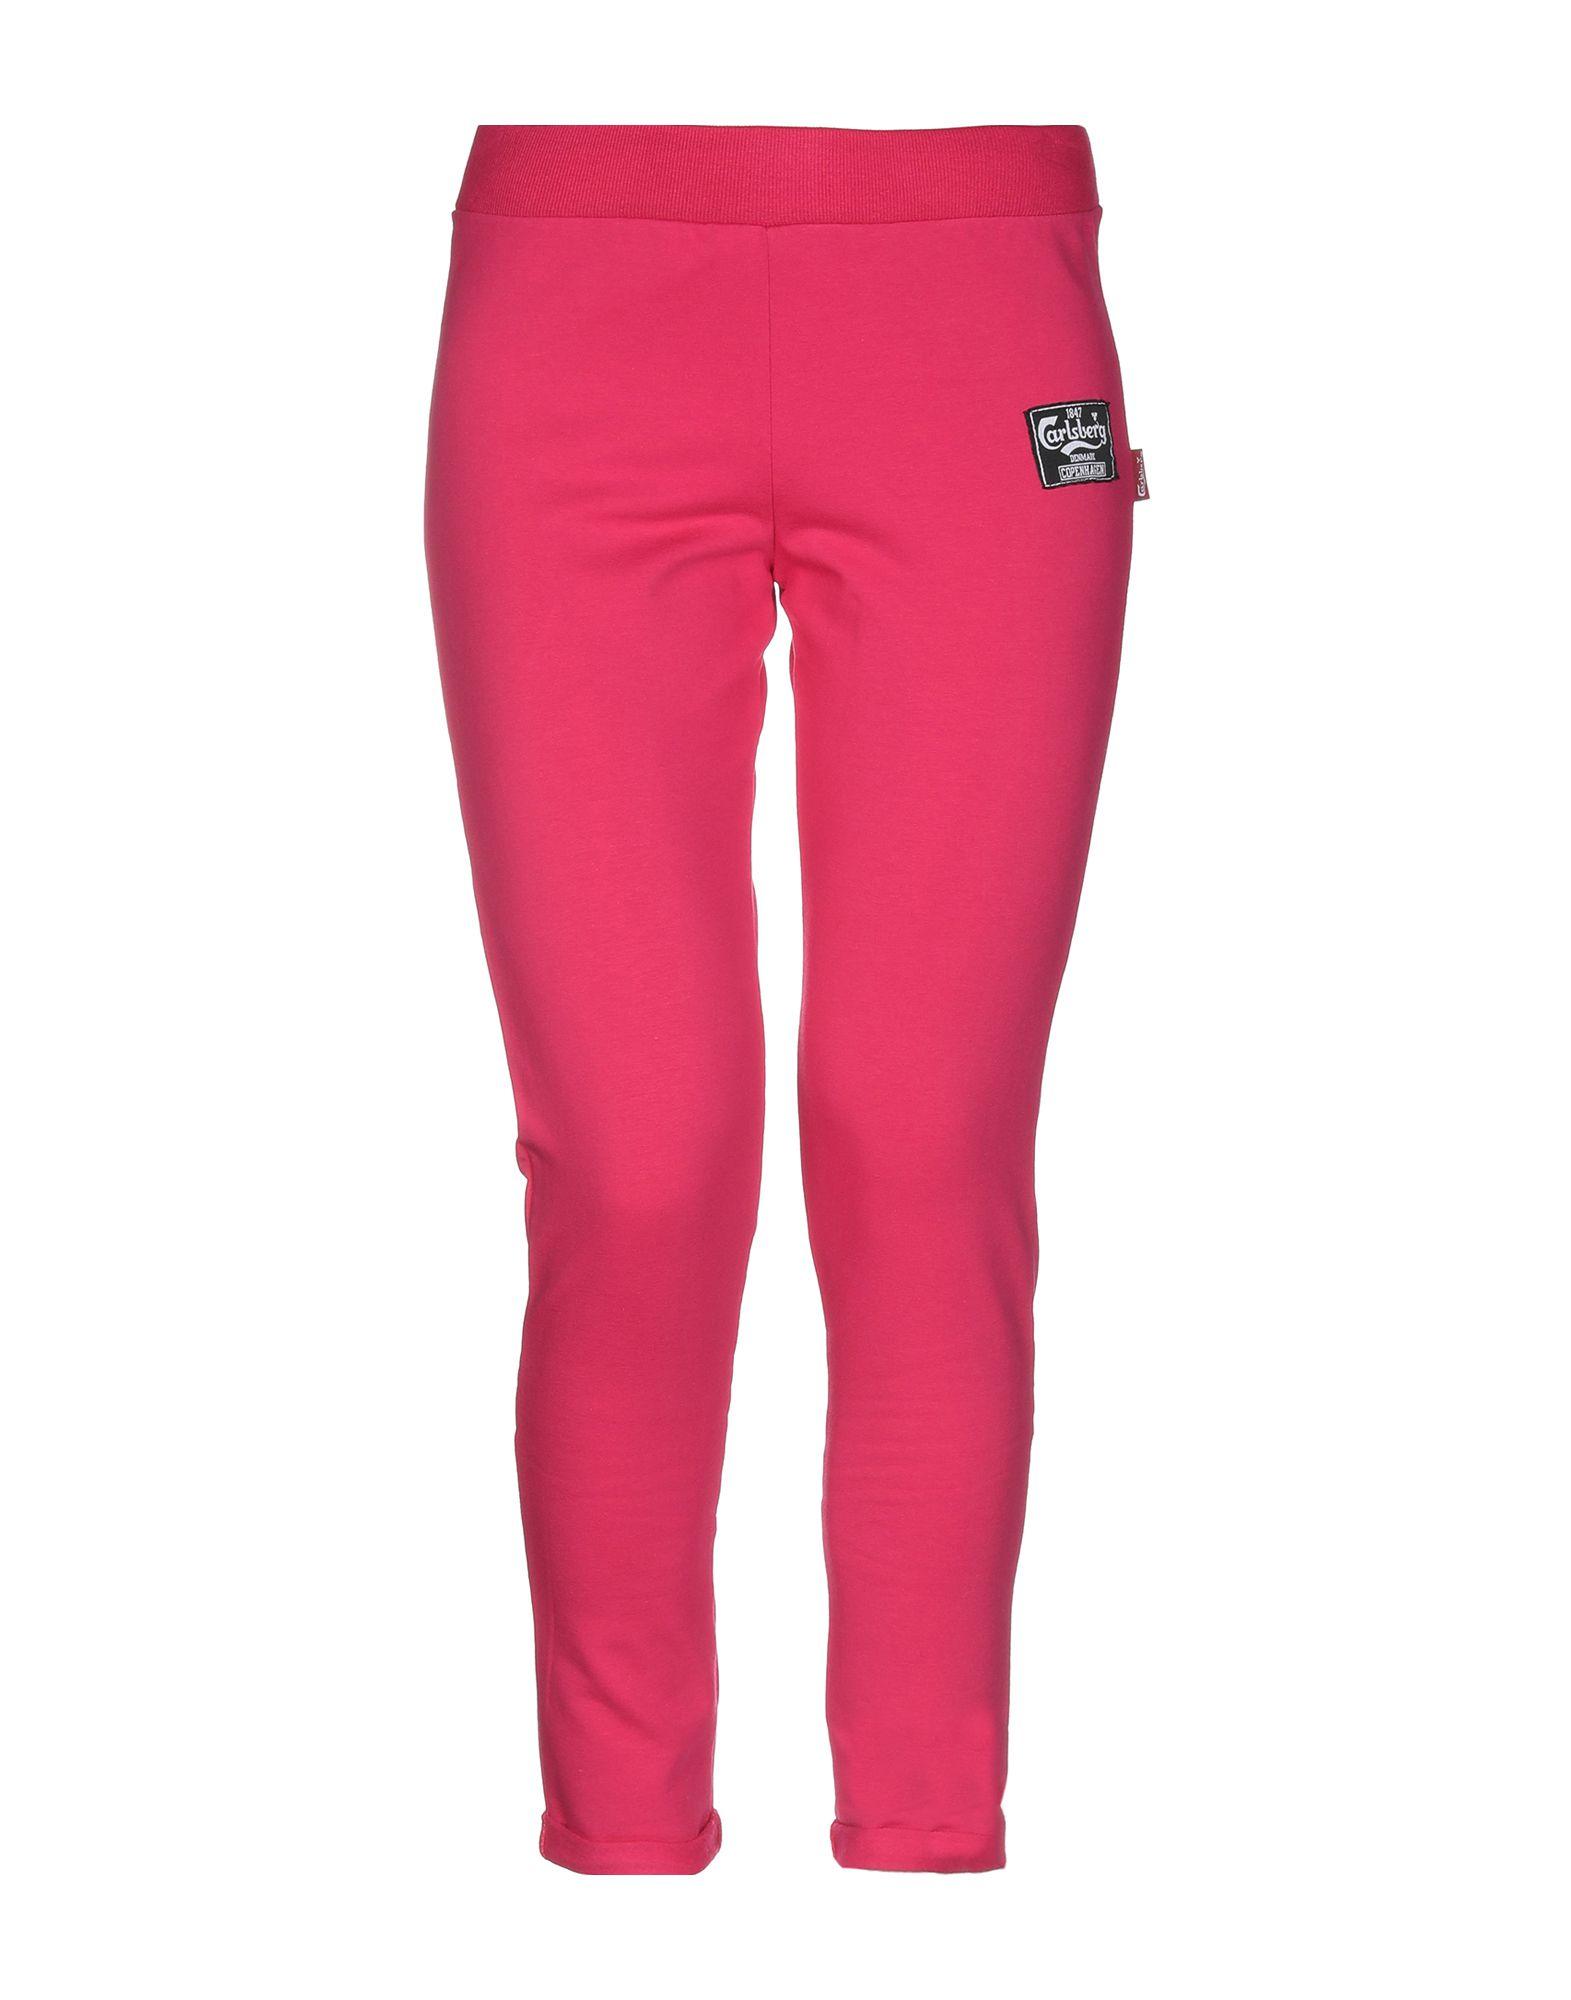 CARLSBERG Повседневные брюки брюки с начесом quelle quelle 970397